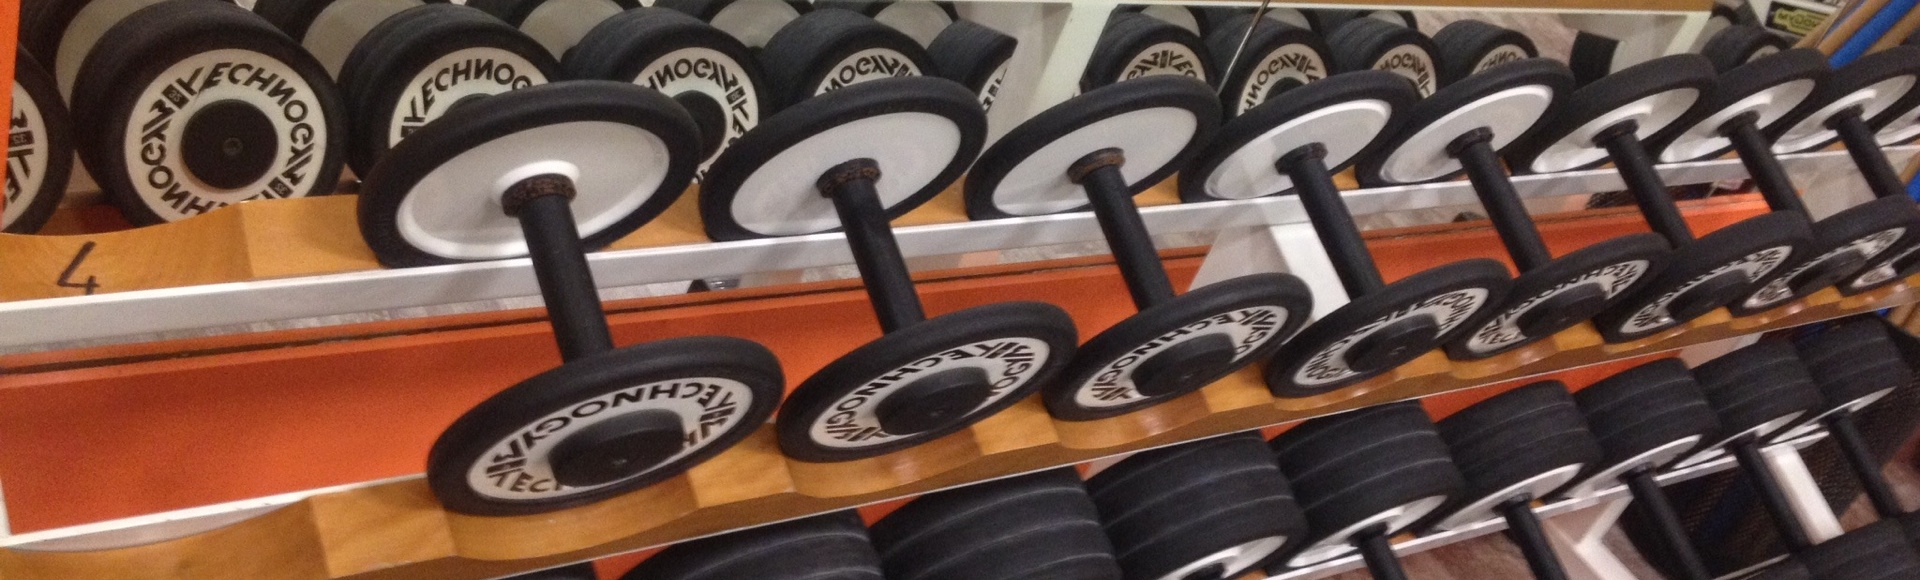 Il centro fitness canovasport